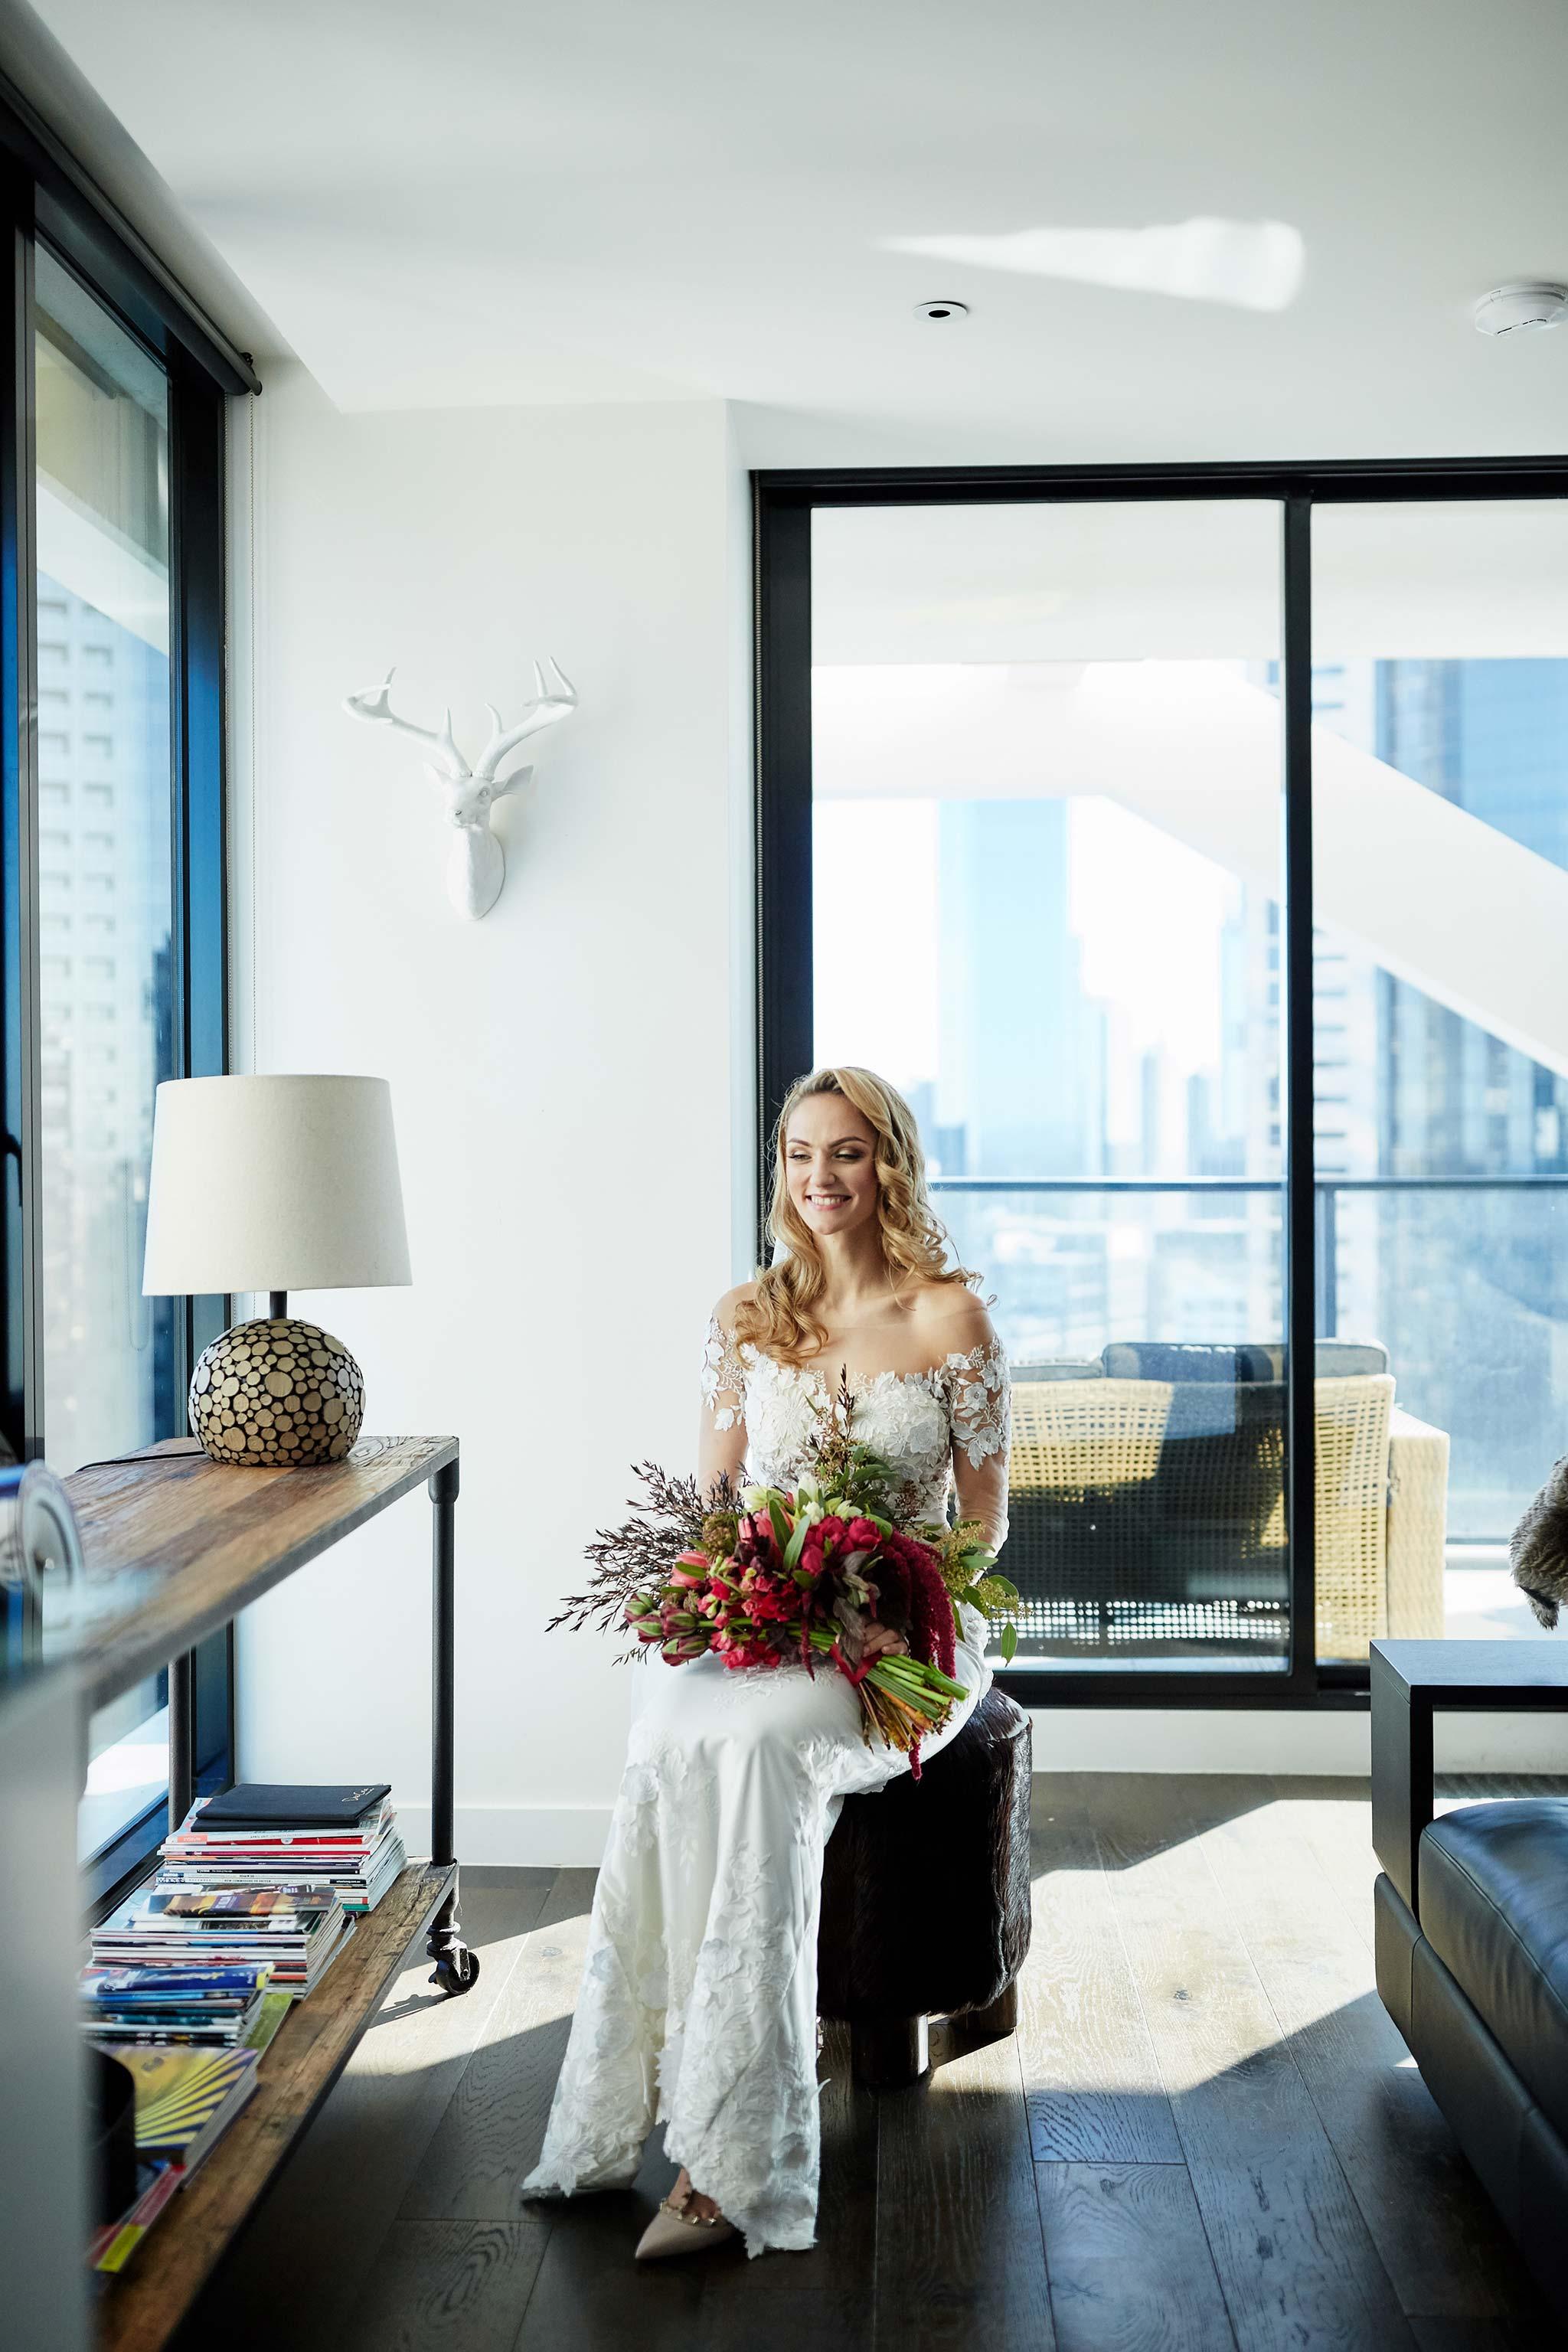 Melbourne-Wedding-Photographer-service-apartment-getting-ready-bride